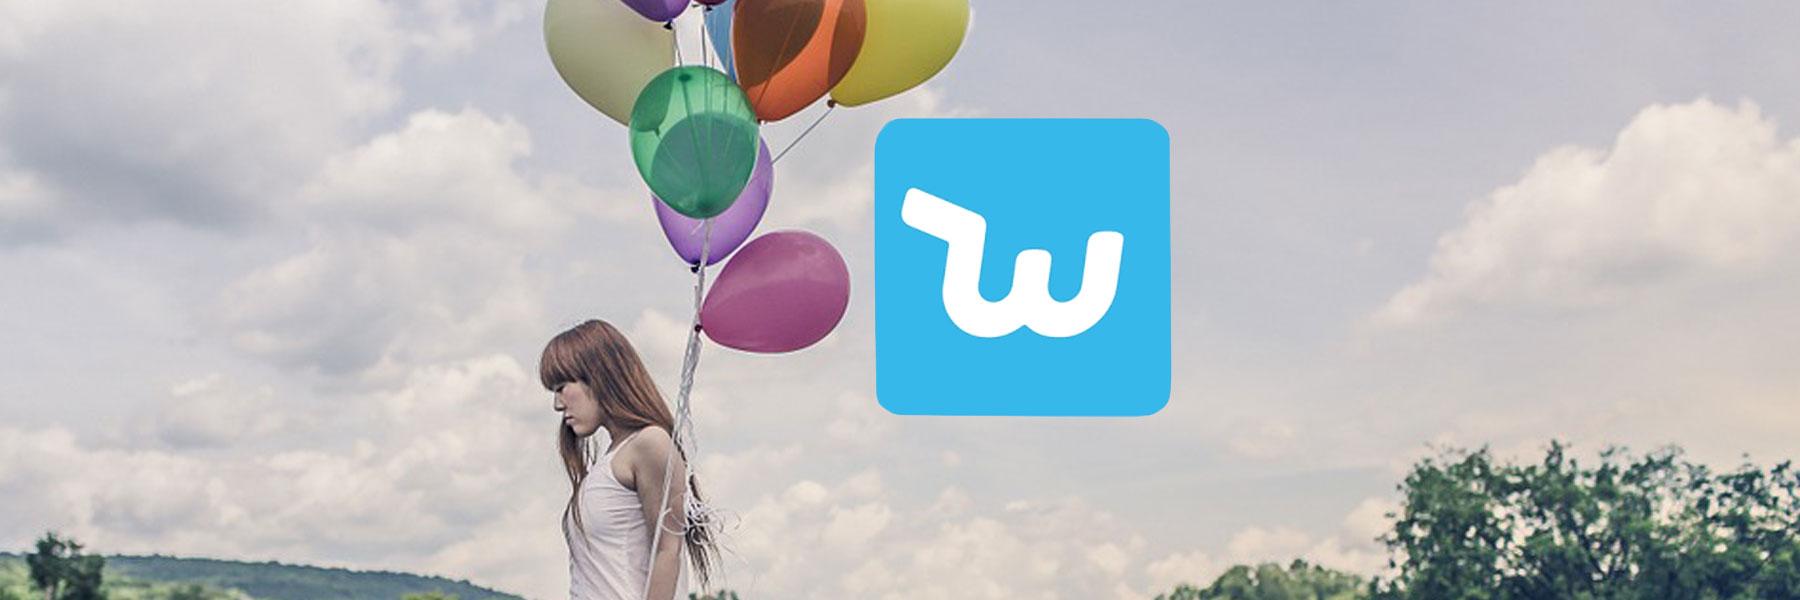 Wish-App-Alternative_1800x600_v03.jpg